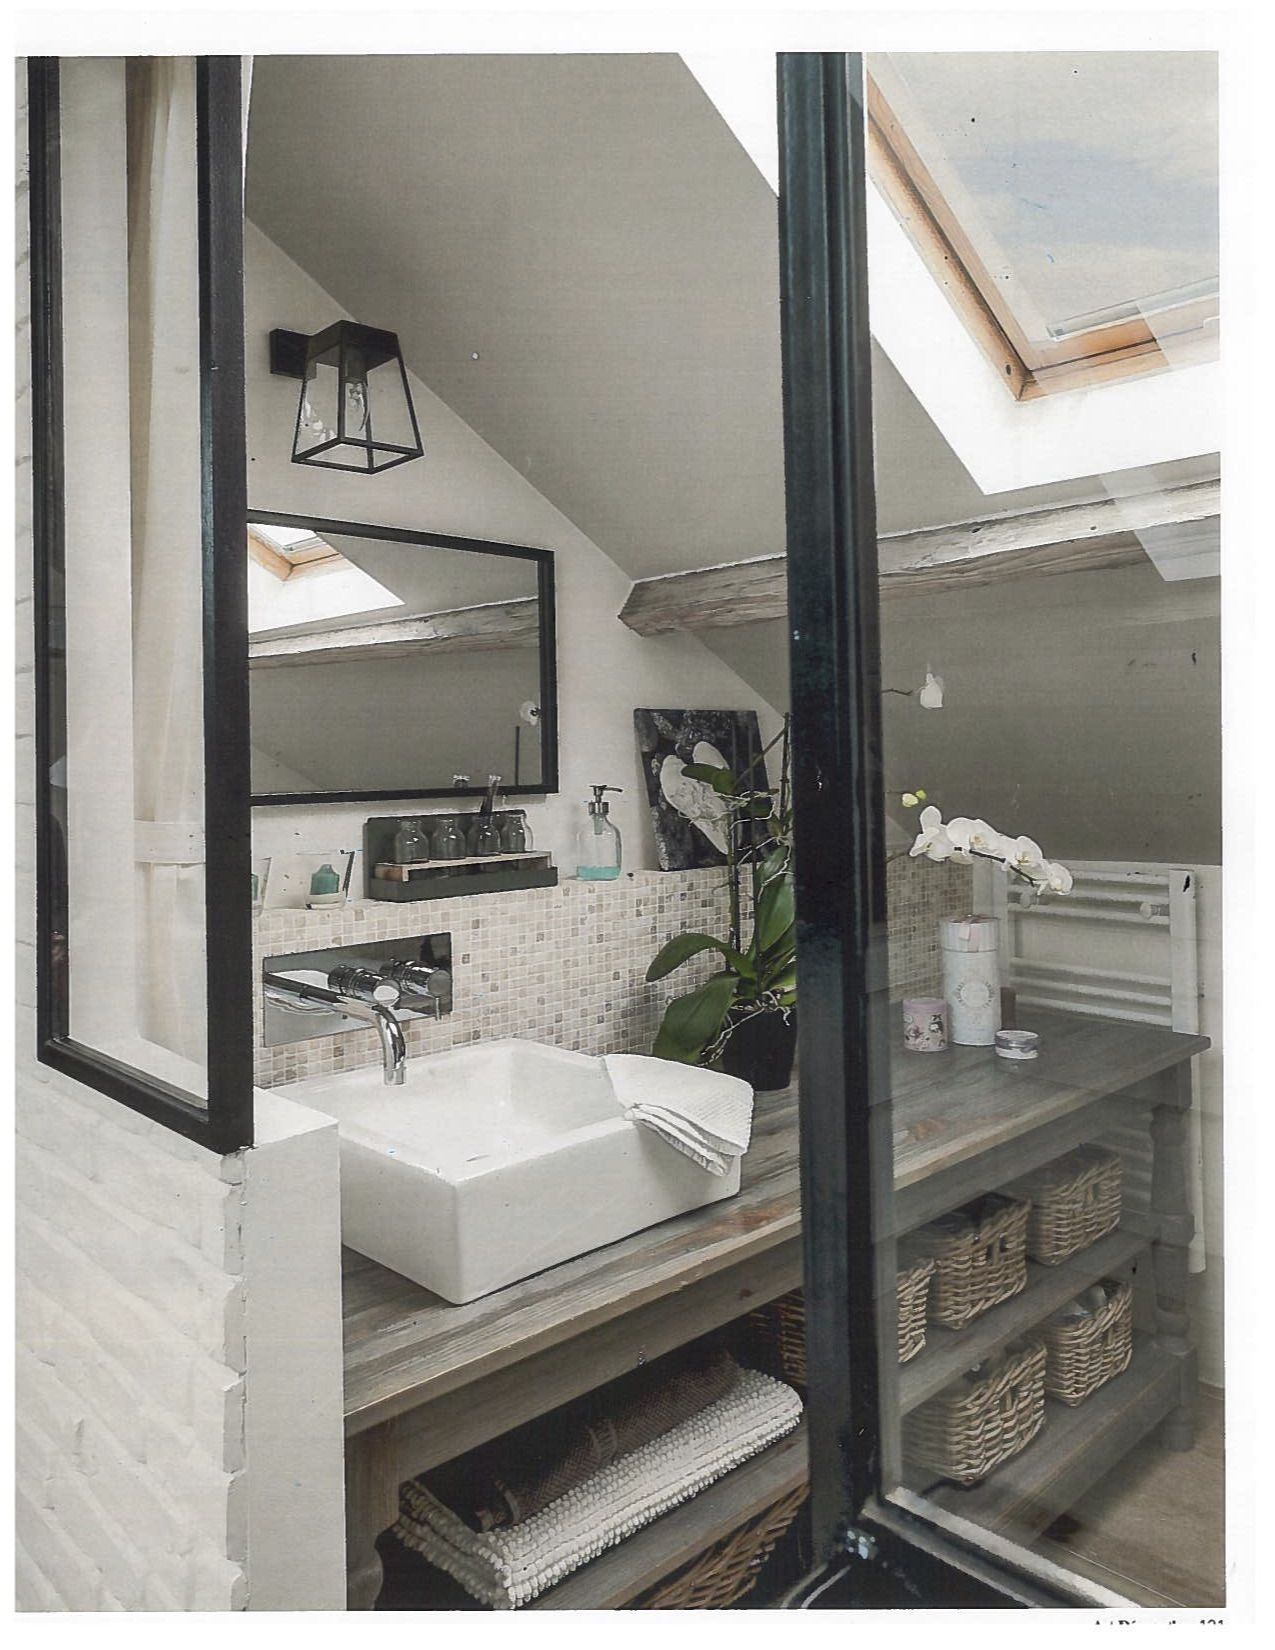 une petite salle de bain pleine de charme | bathroom